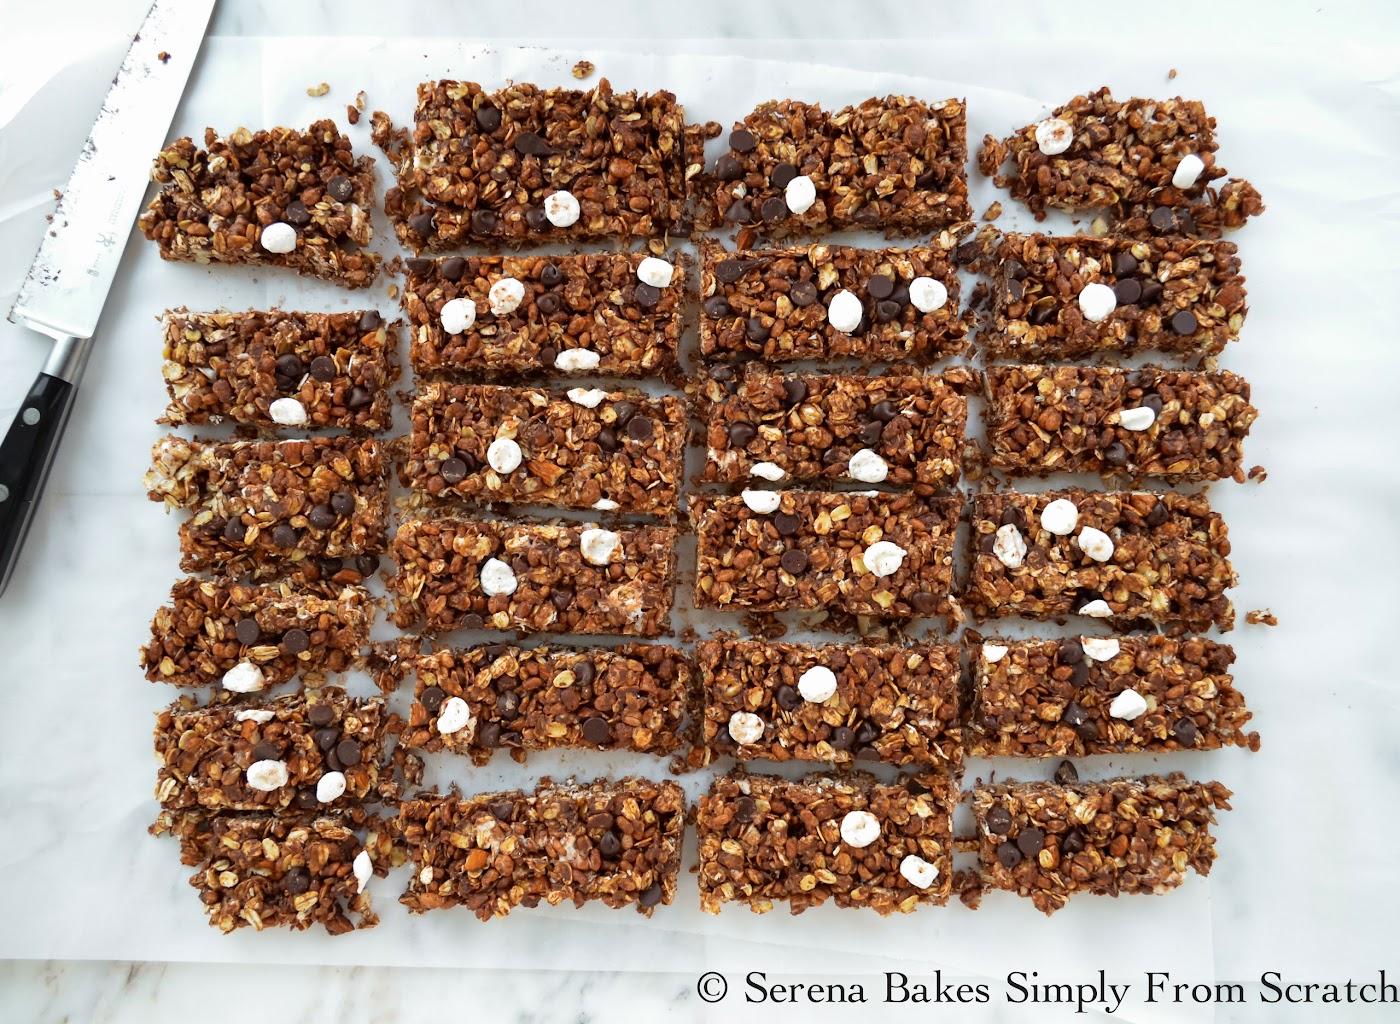 Gluten-Free-No-Bake-S'mores-Granola-Bars-Cut.jpg